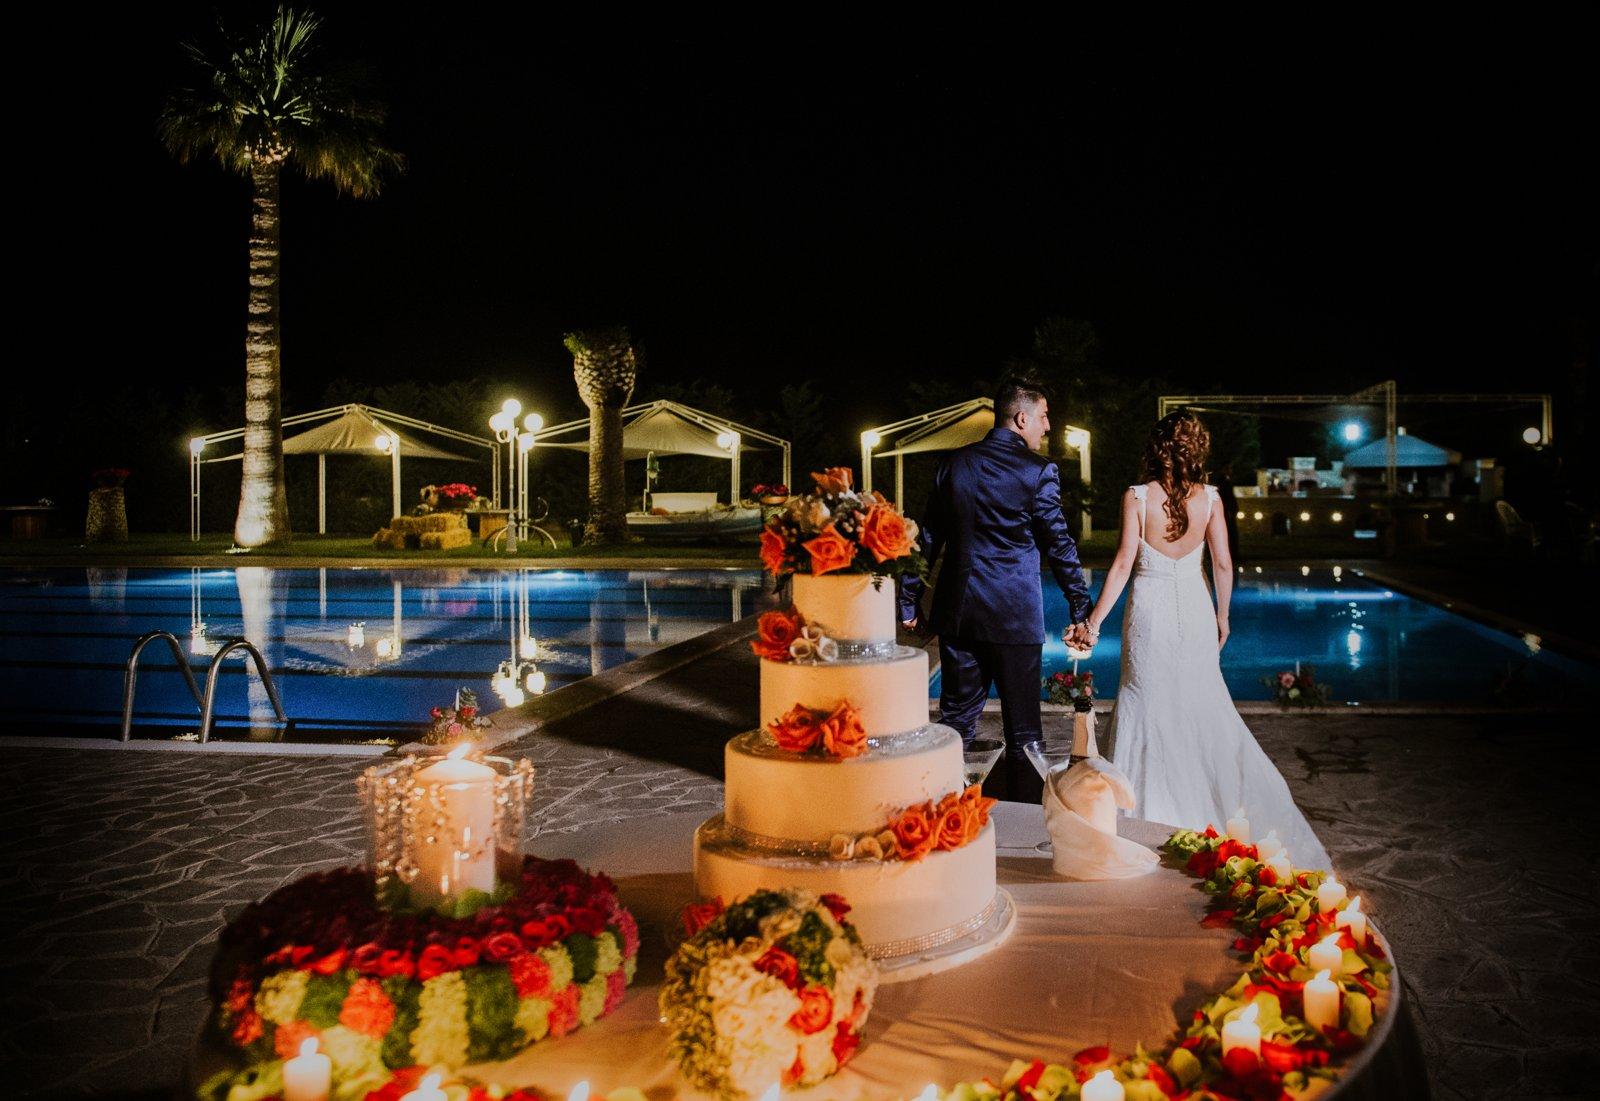 Pranzo Nuziale In Inglese : Un matrimonio vintage e letterario wedding wonderland